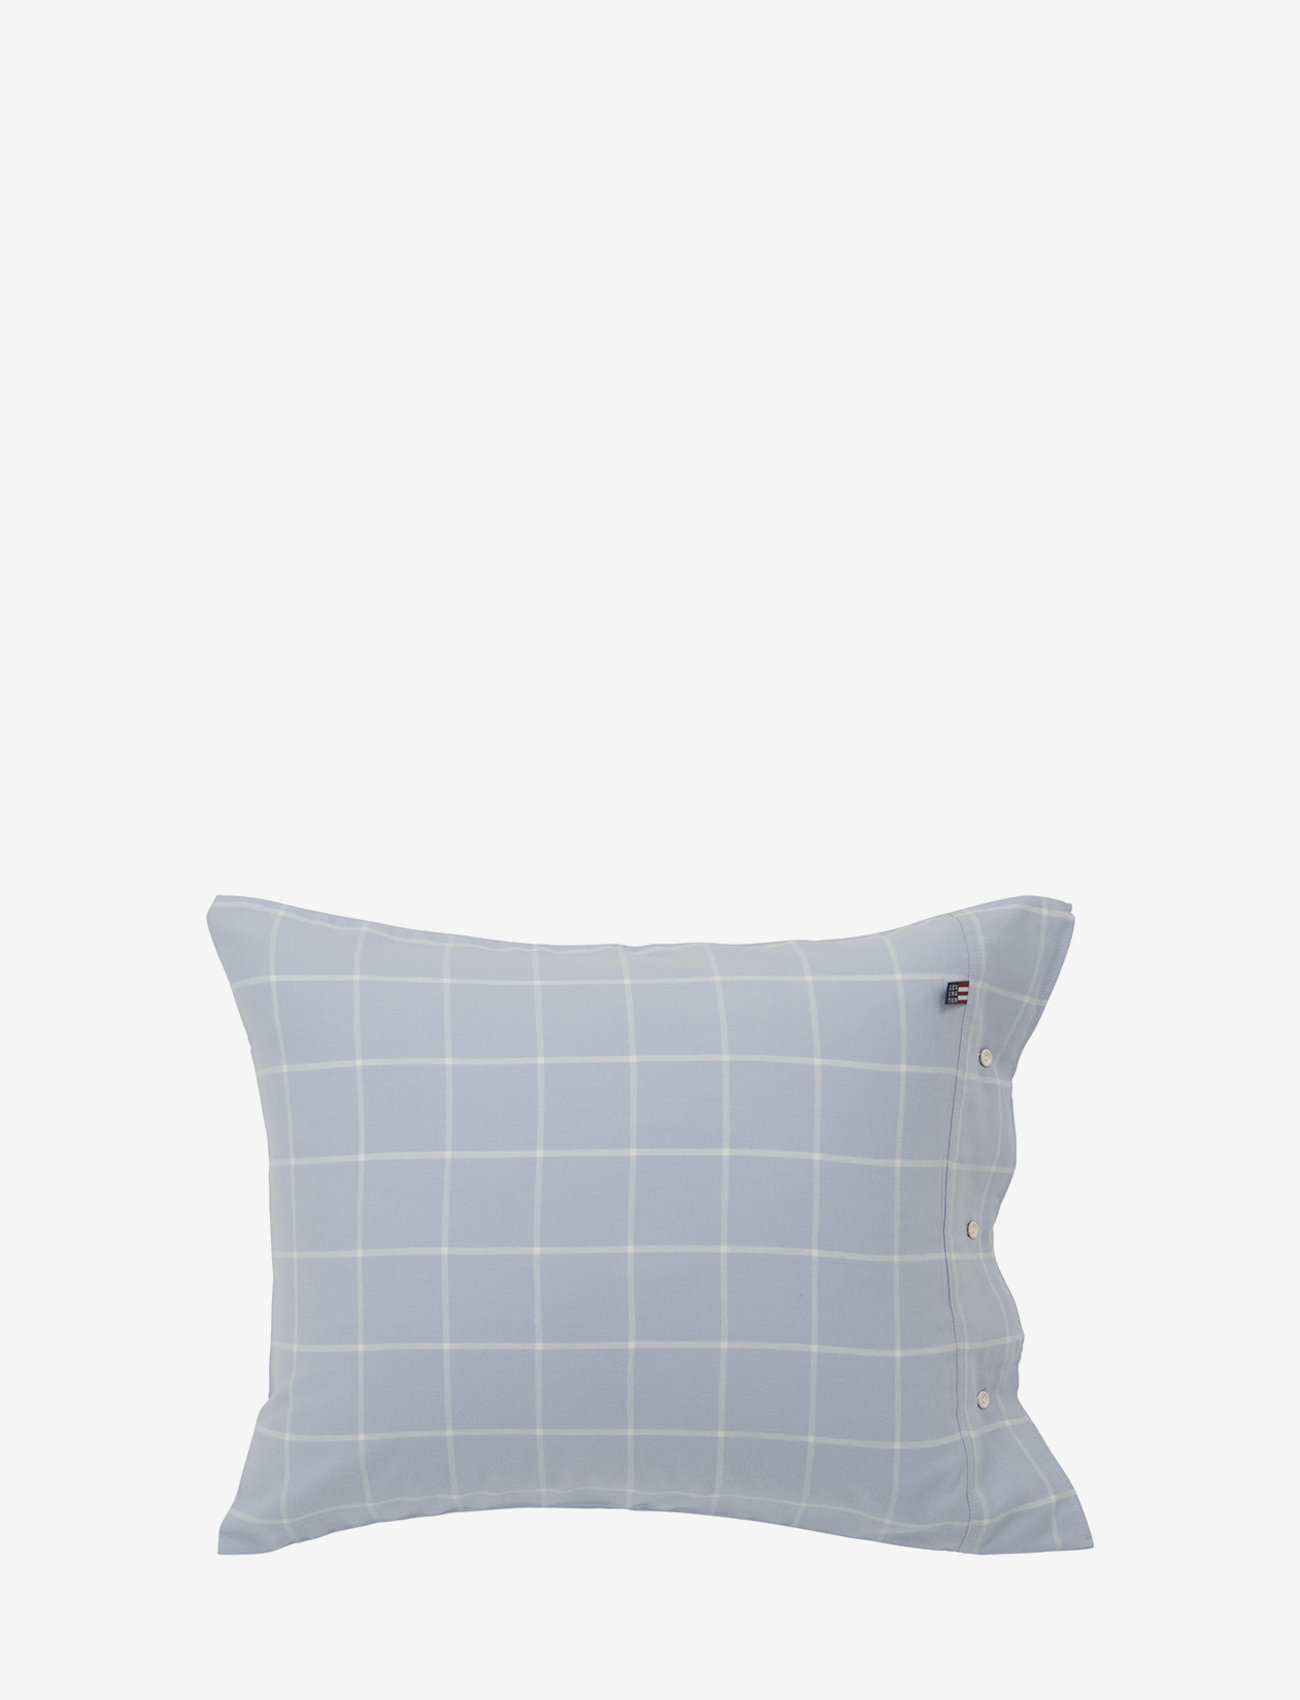 Lexington Home - Hotel Light Flannel Lt Blue/White Pillowcase - taies d'oreiller - lt blue/white - 0